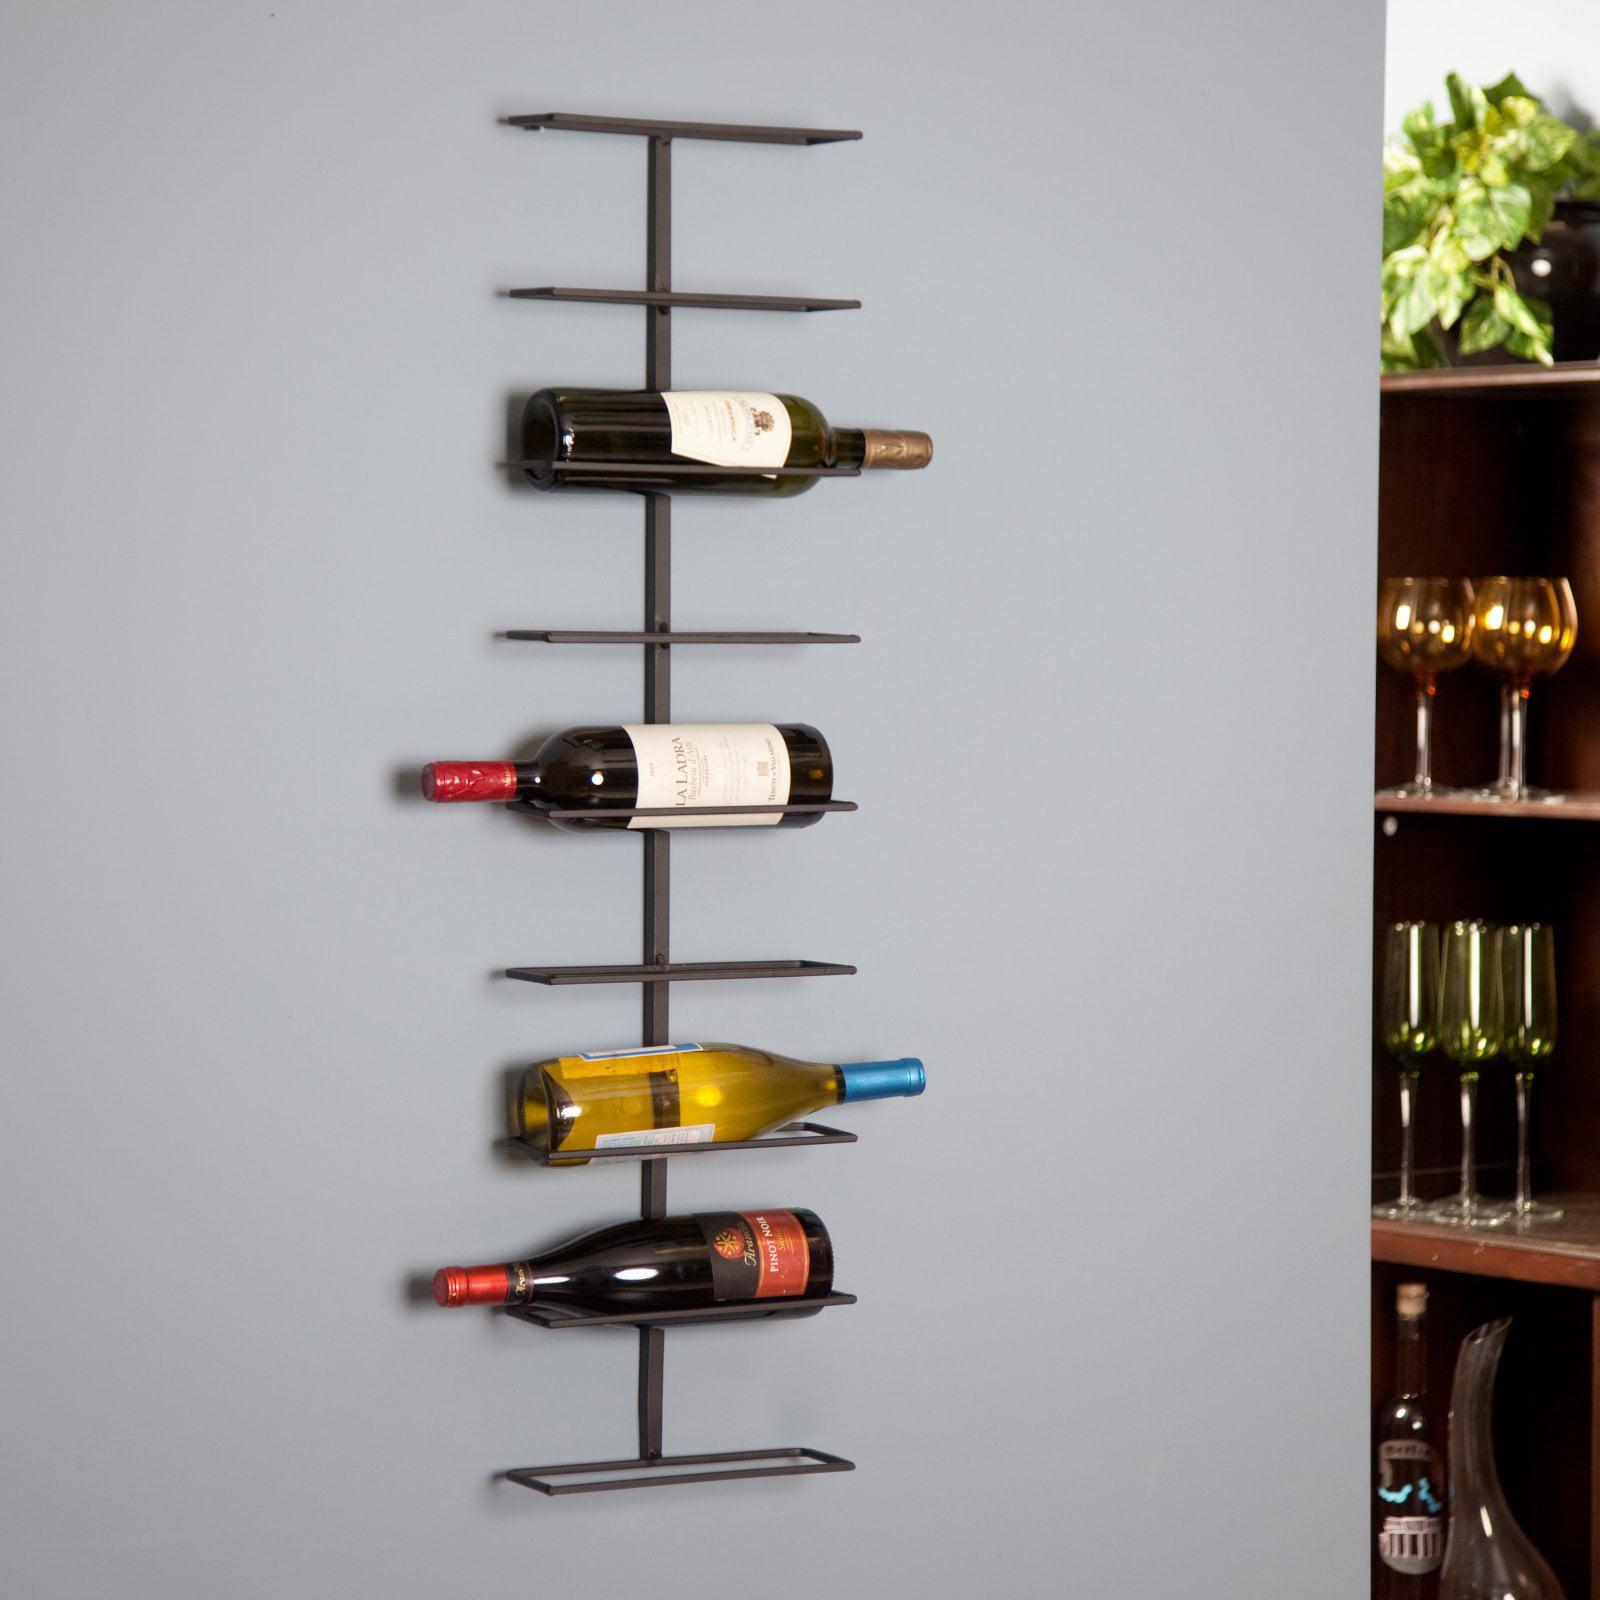 Oenophilia Wine Ledge 9-Bottle Wall Wine Rack by Oenophilia